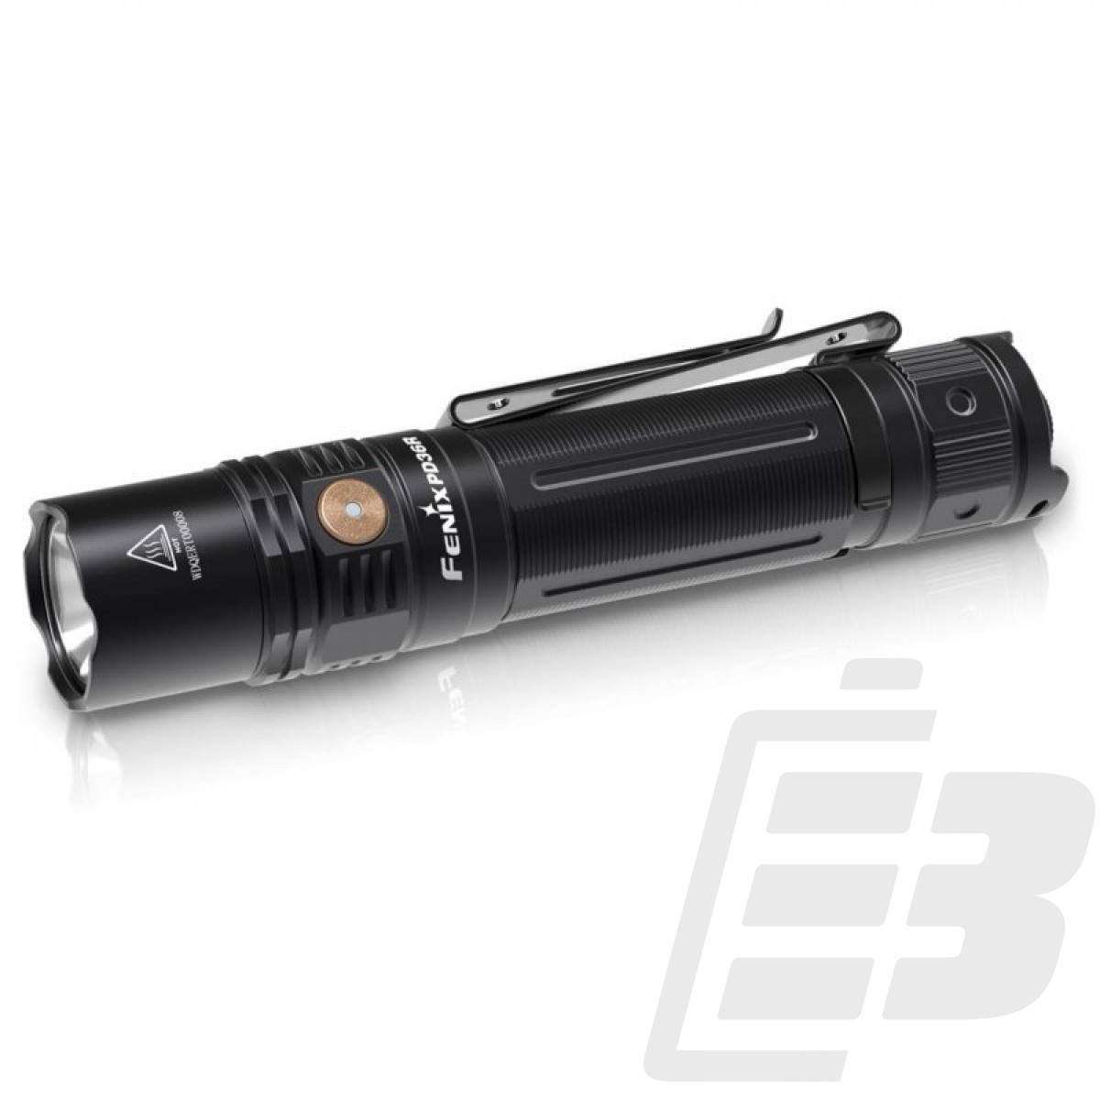 Fenix PD36R LED Flashlight